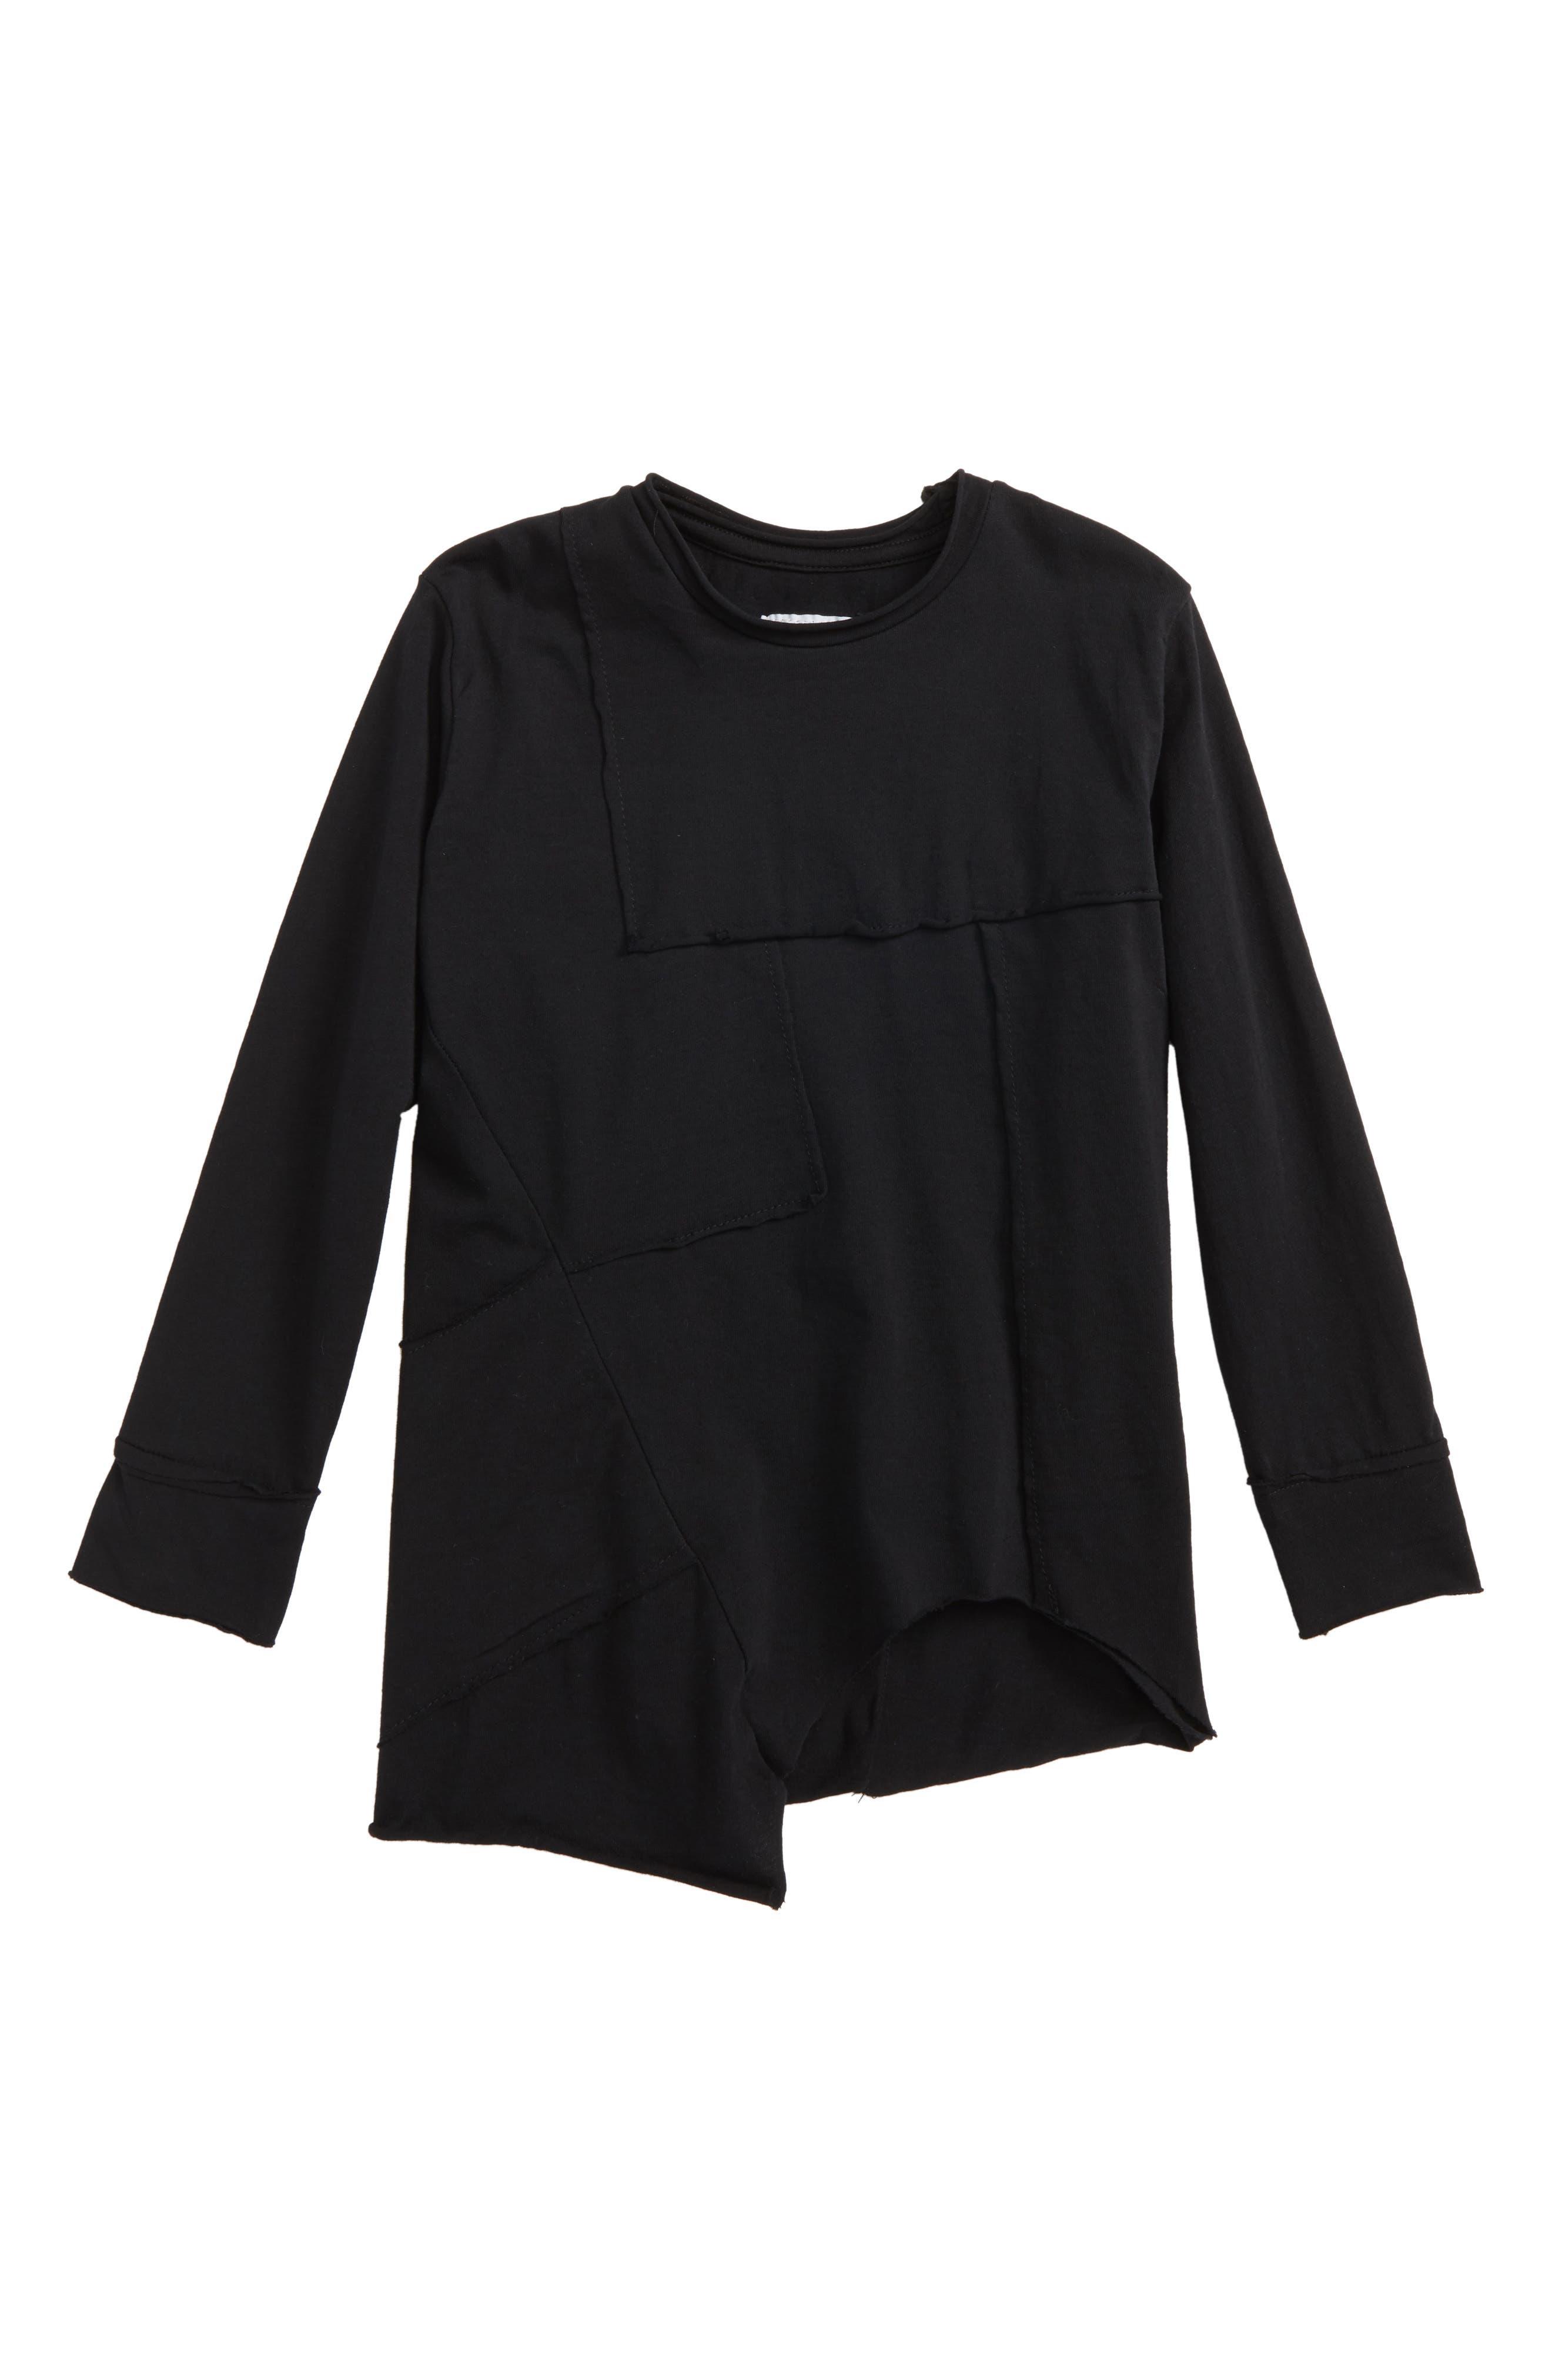 Patchwork Shirt,                         Main,                         color, 001